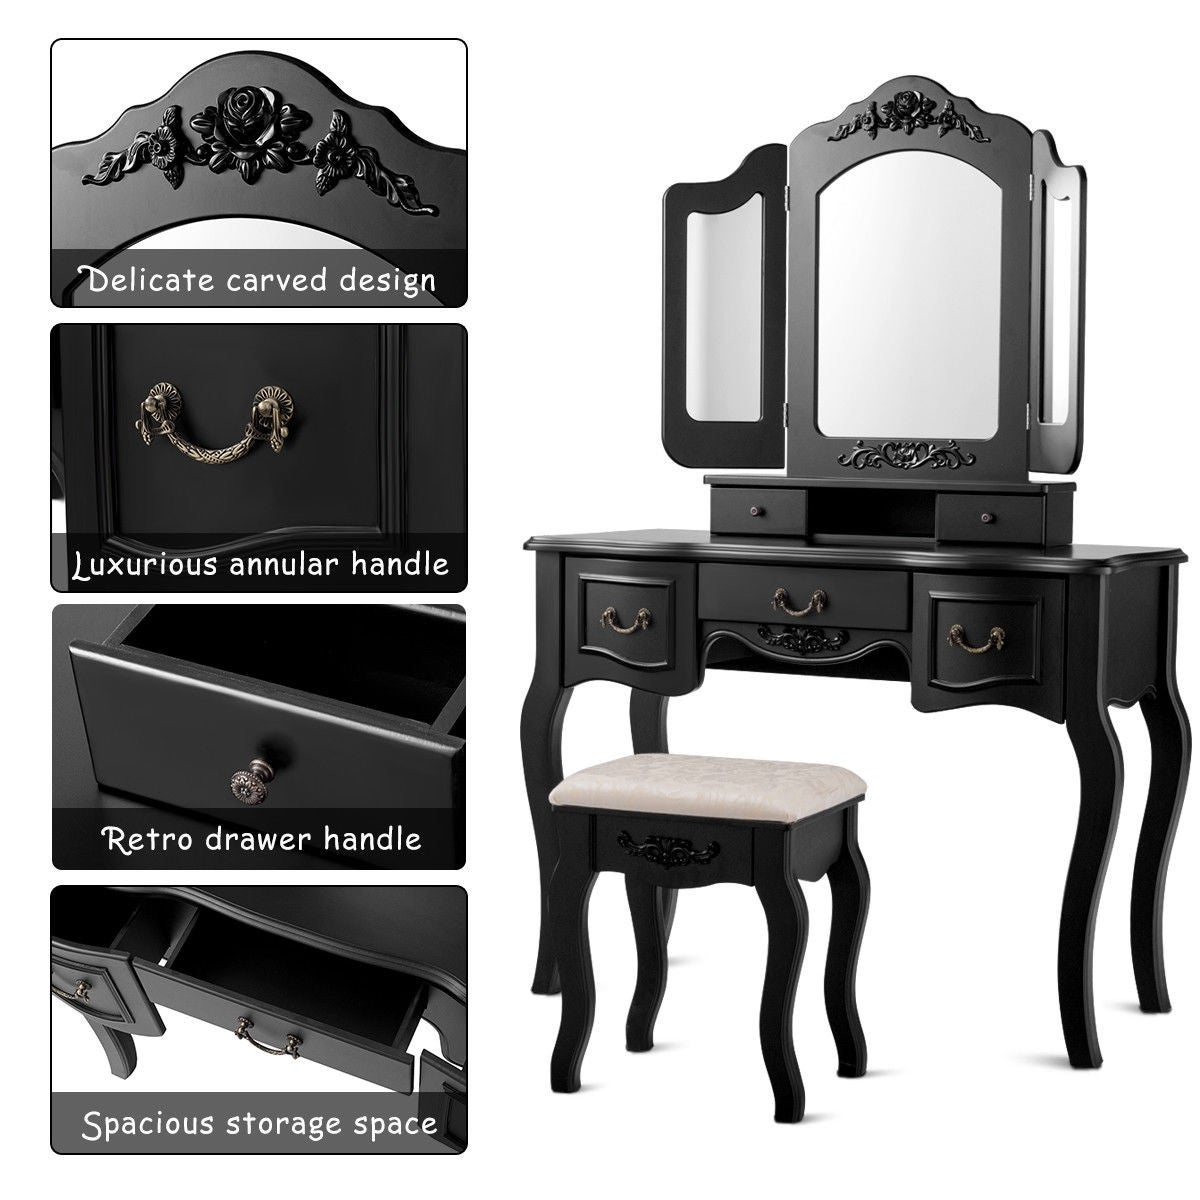 Tri Folding Vintage Vanity Makeup Dressing Table Set 5 Drawers Christmas Black Black Overstock 28422403